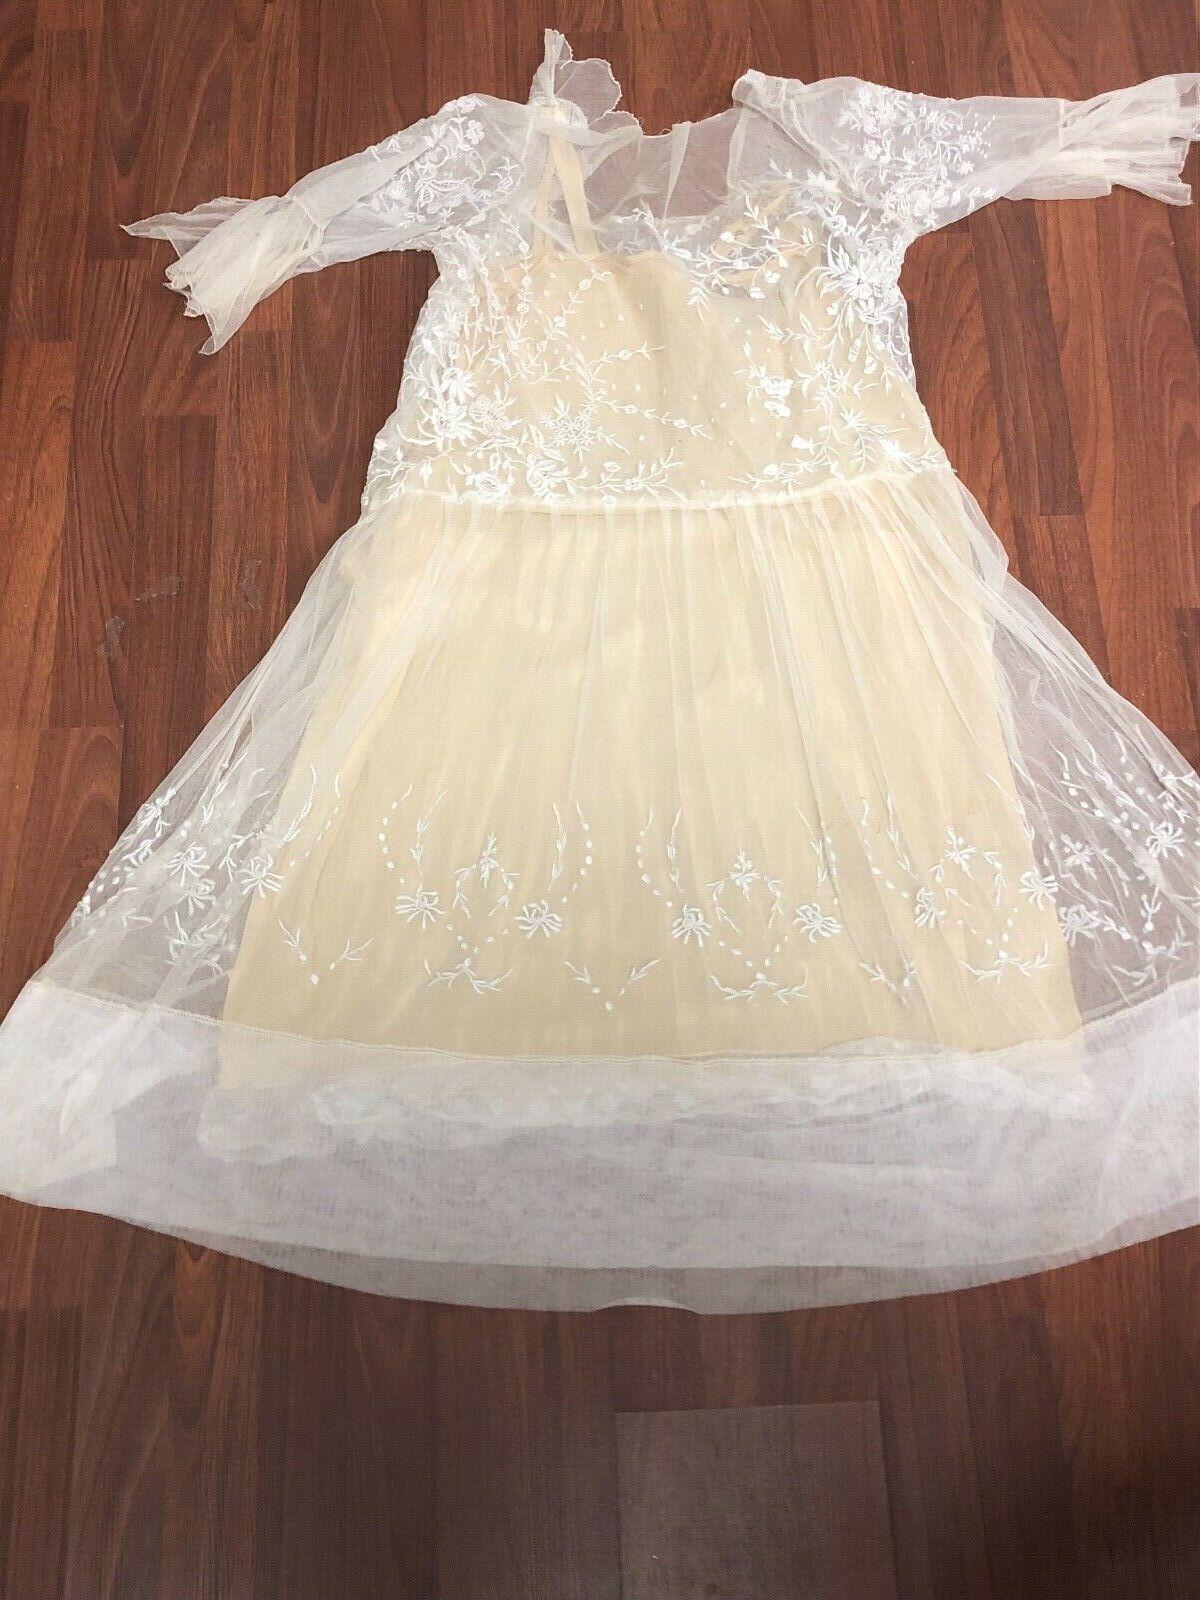 Antique Edwardian White Mesh Dress with Floral Em… - image 8